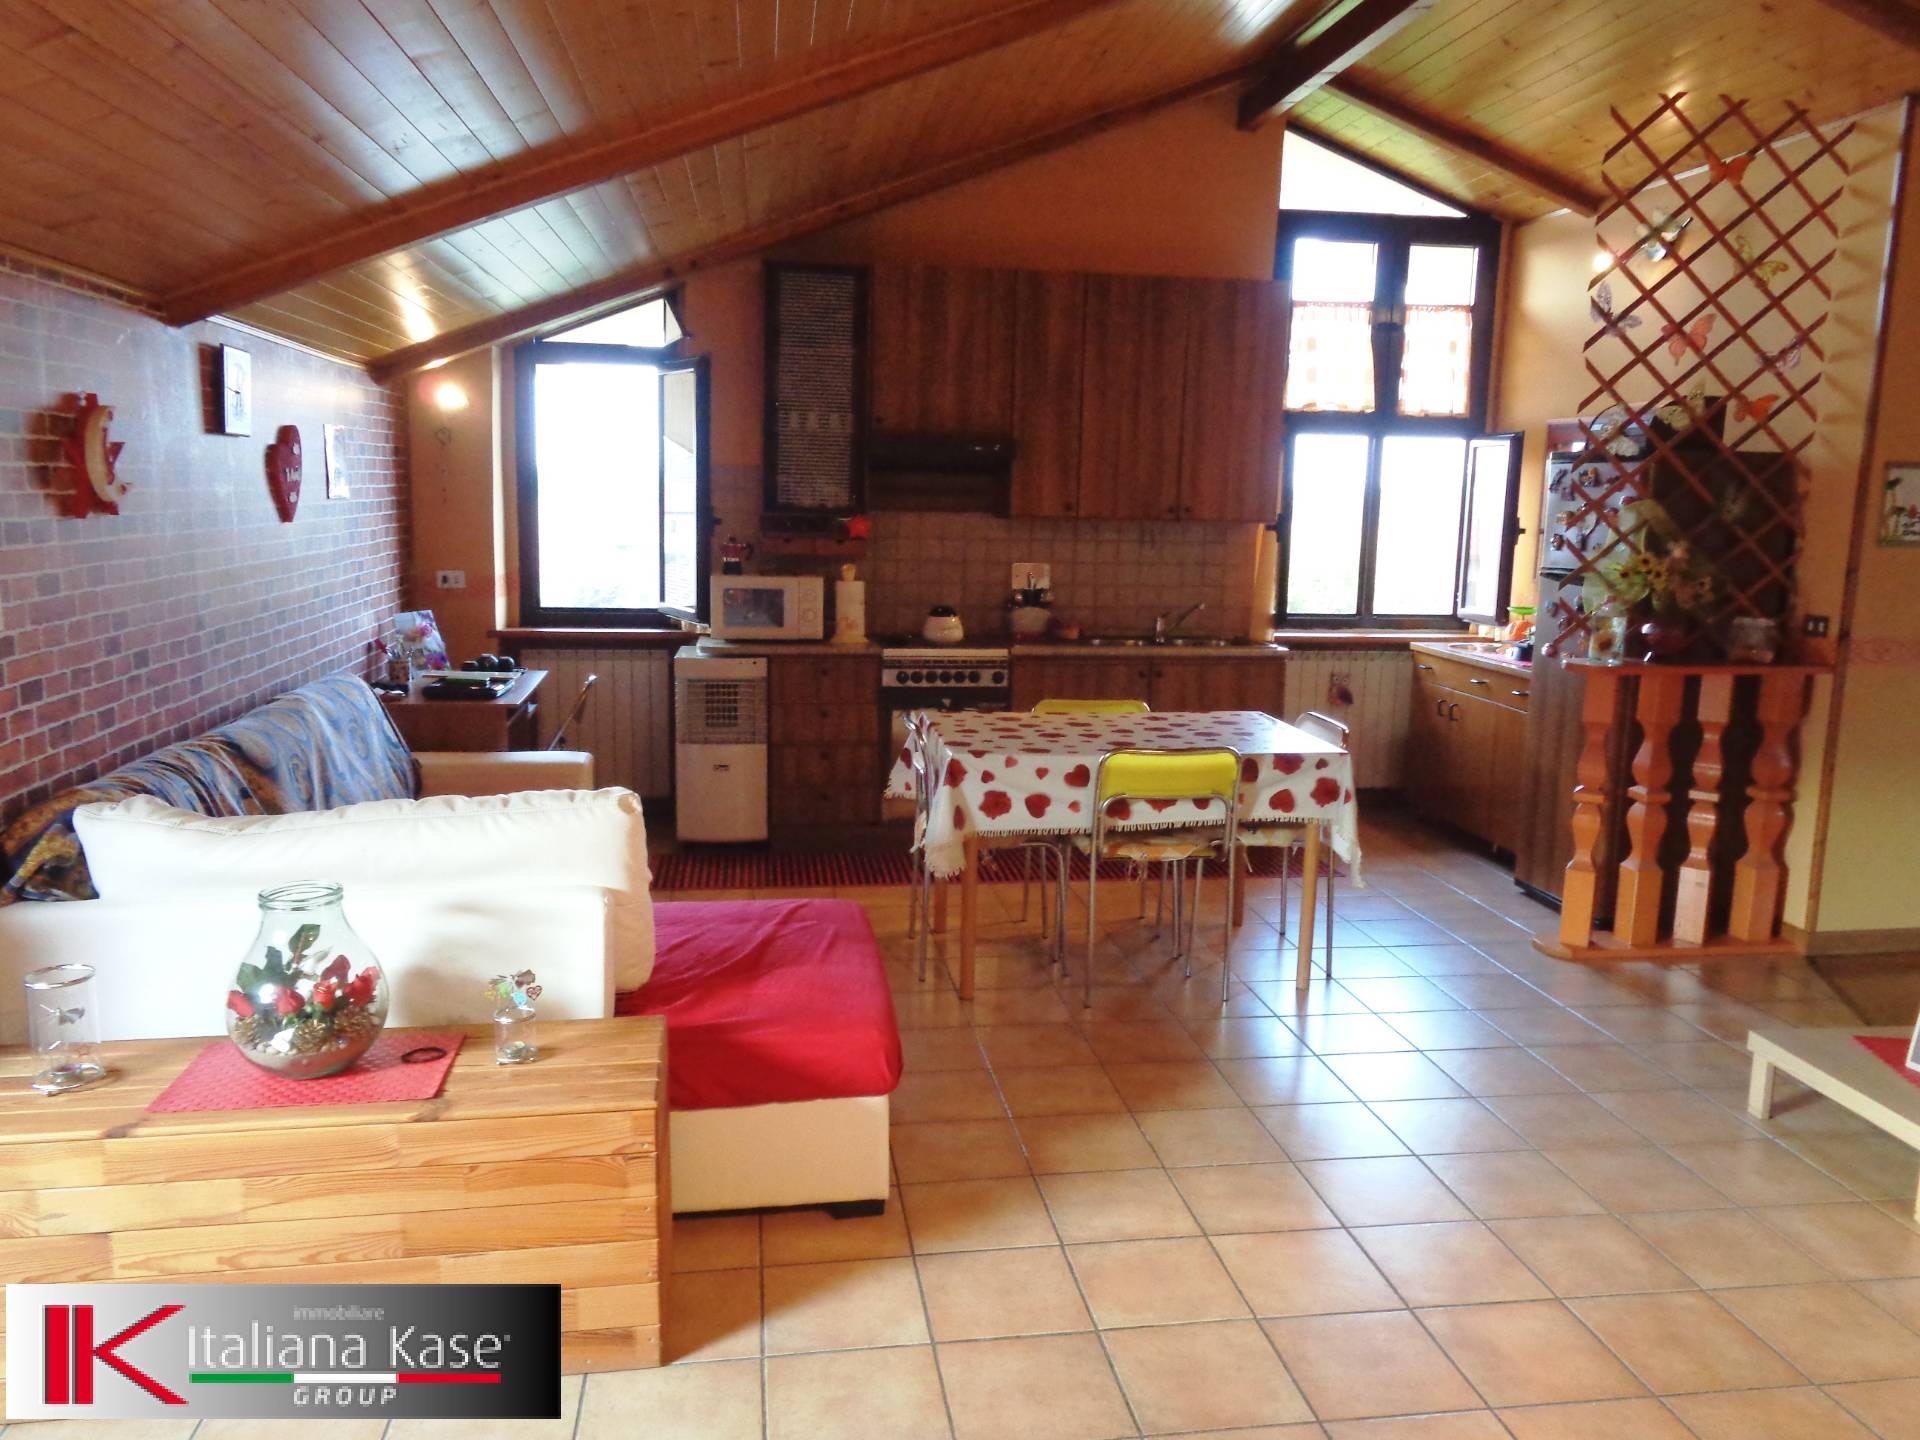 Bilocale Torrazza Piemonte  5